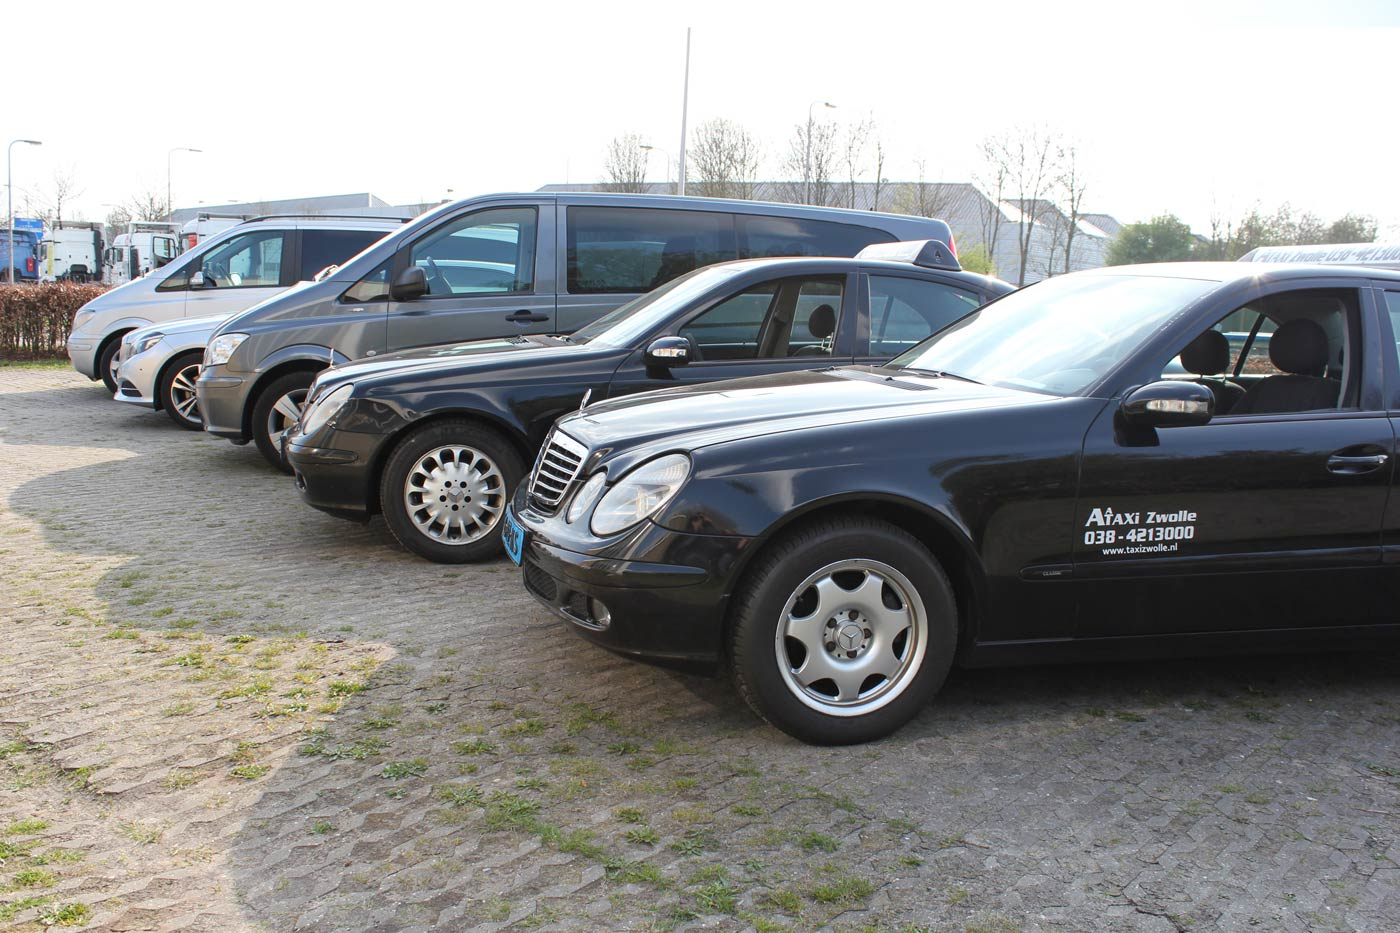 Taxi Zwolle ziekenvervoer